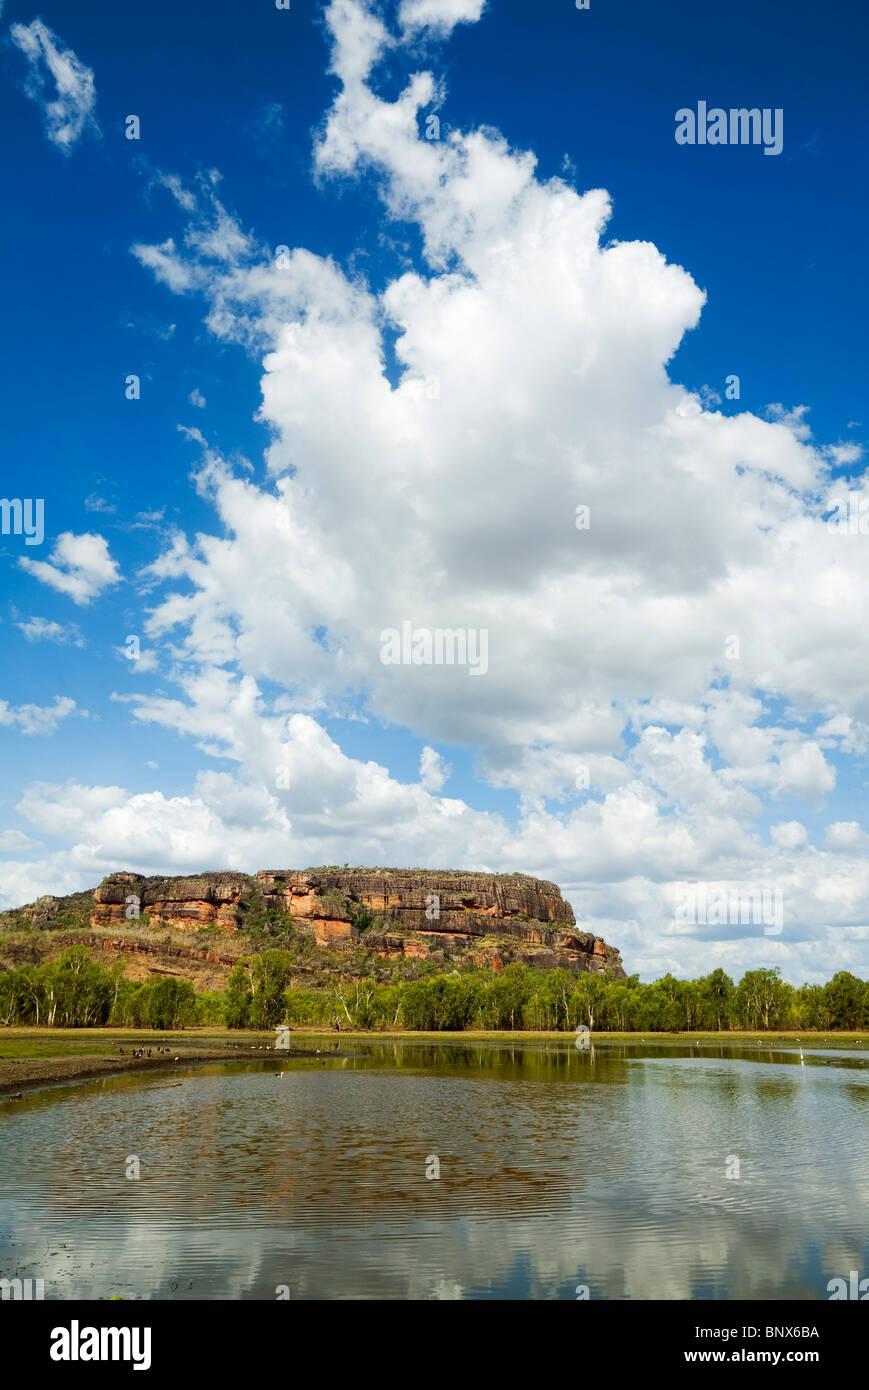 View across Anbangbang Billabong.  Nourlangie, Kakadu National Park, Northern Territory, AUSTRALIA. - Stock Image